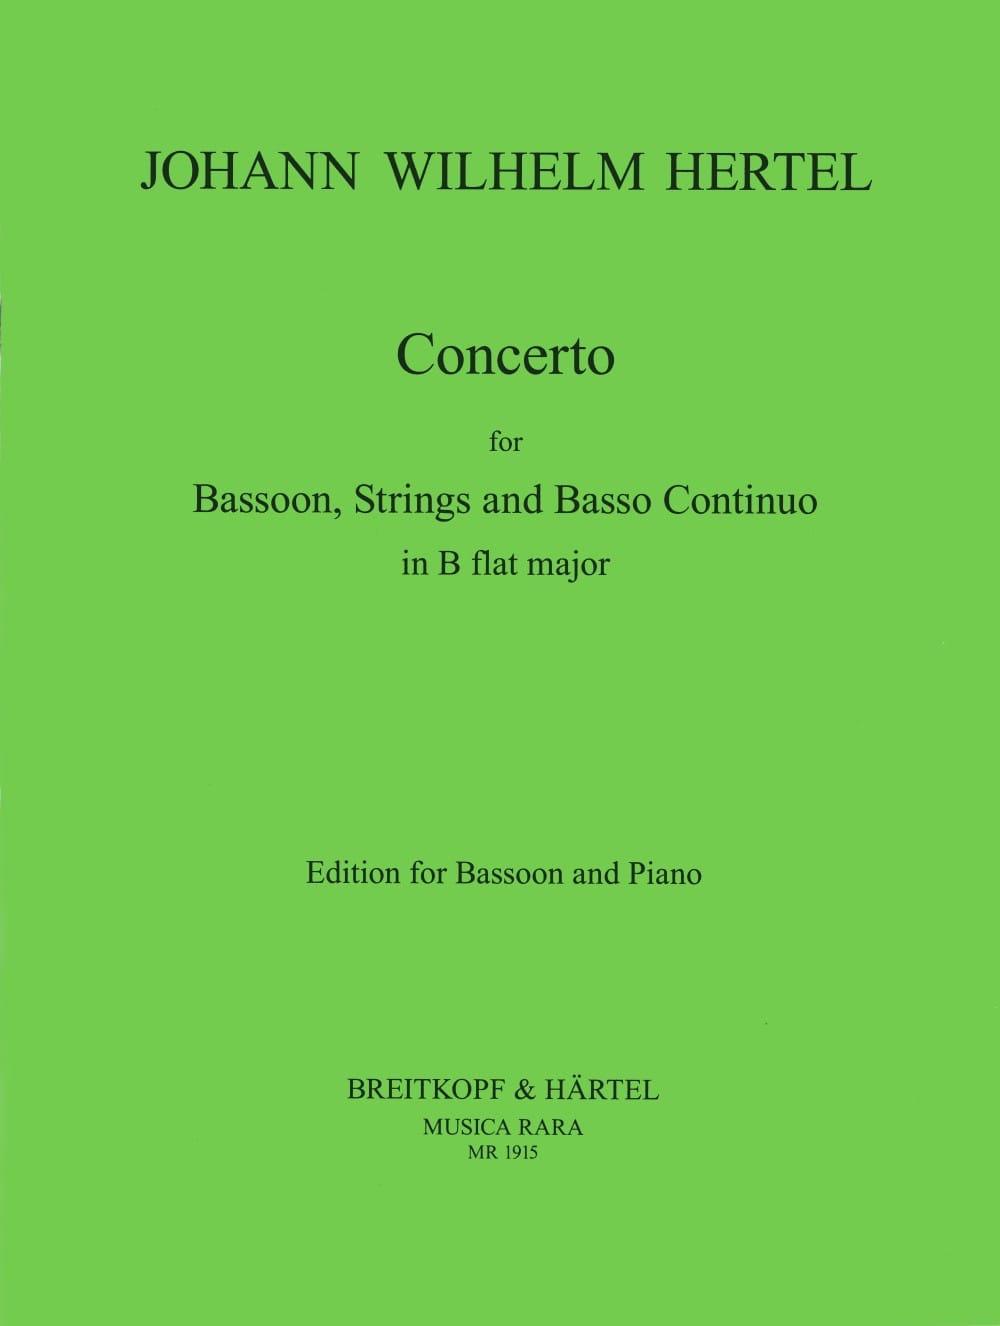 Concerto in B flat - Johann Wilhelm Hertel - laflutedepan.com